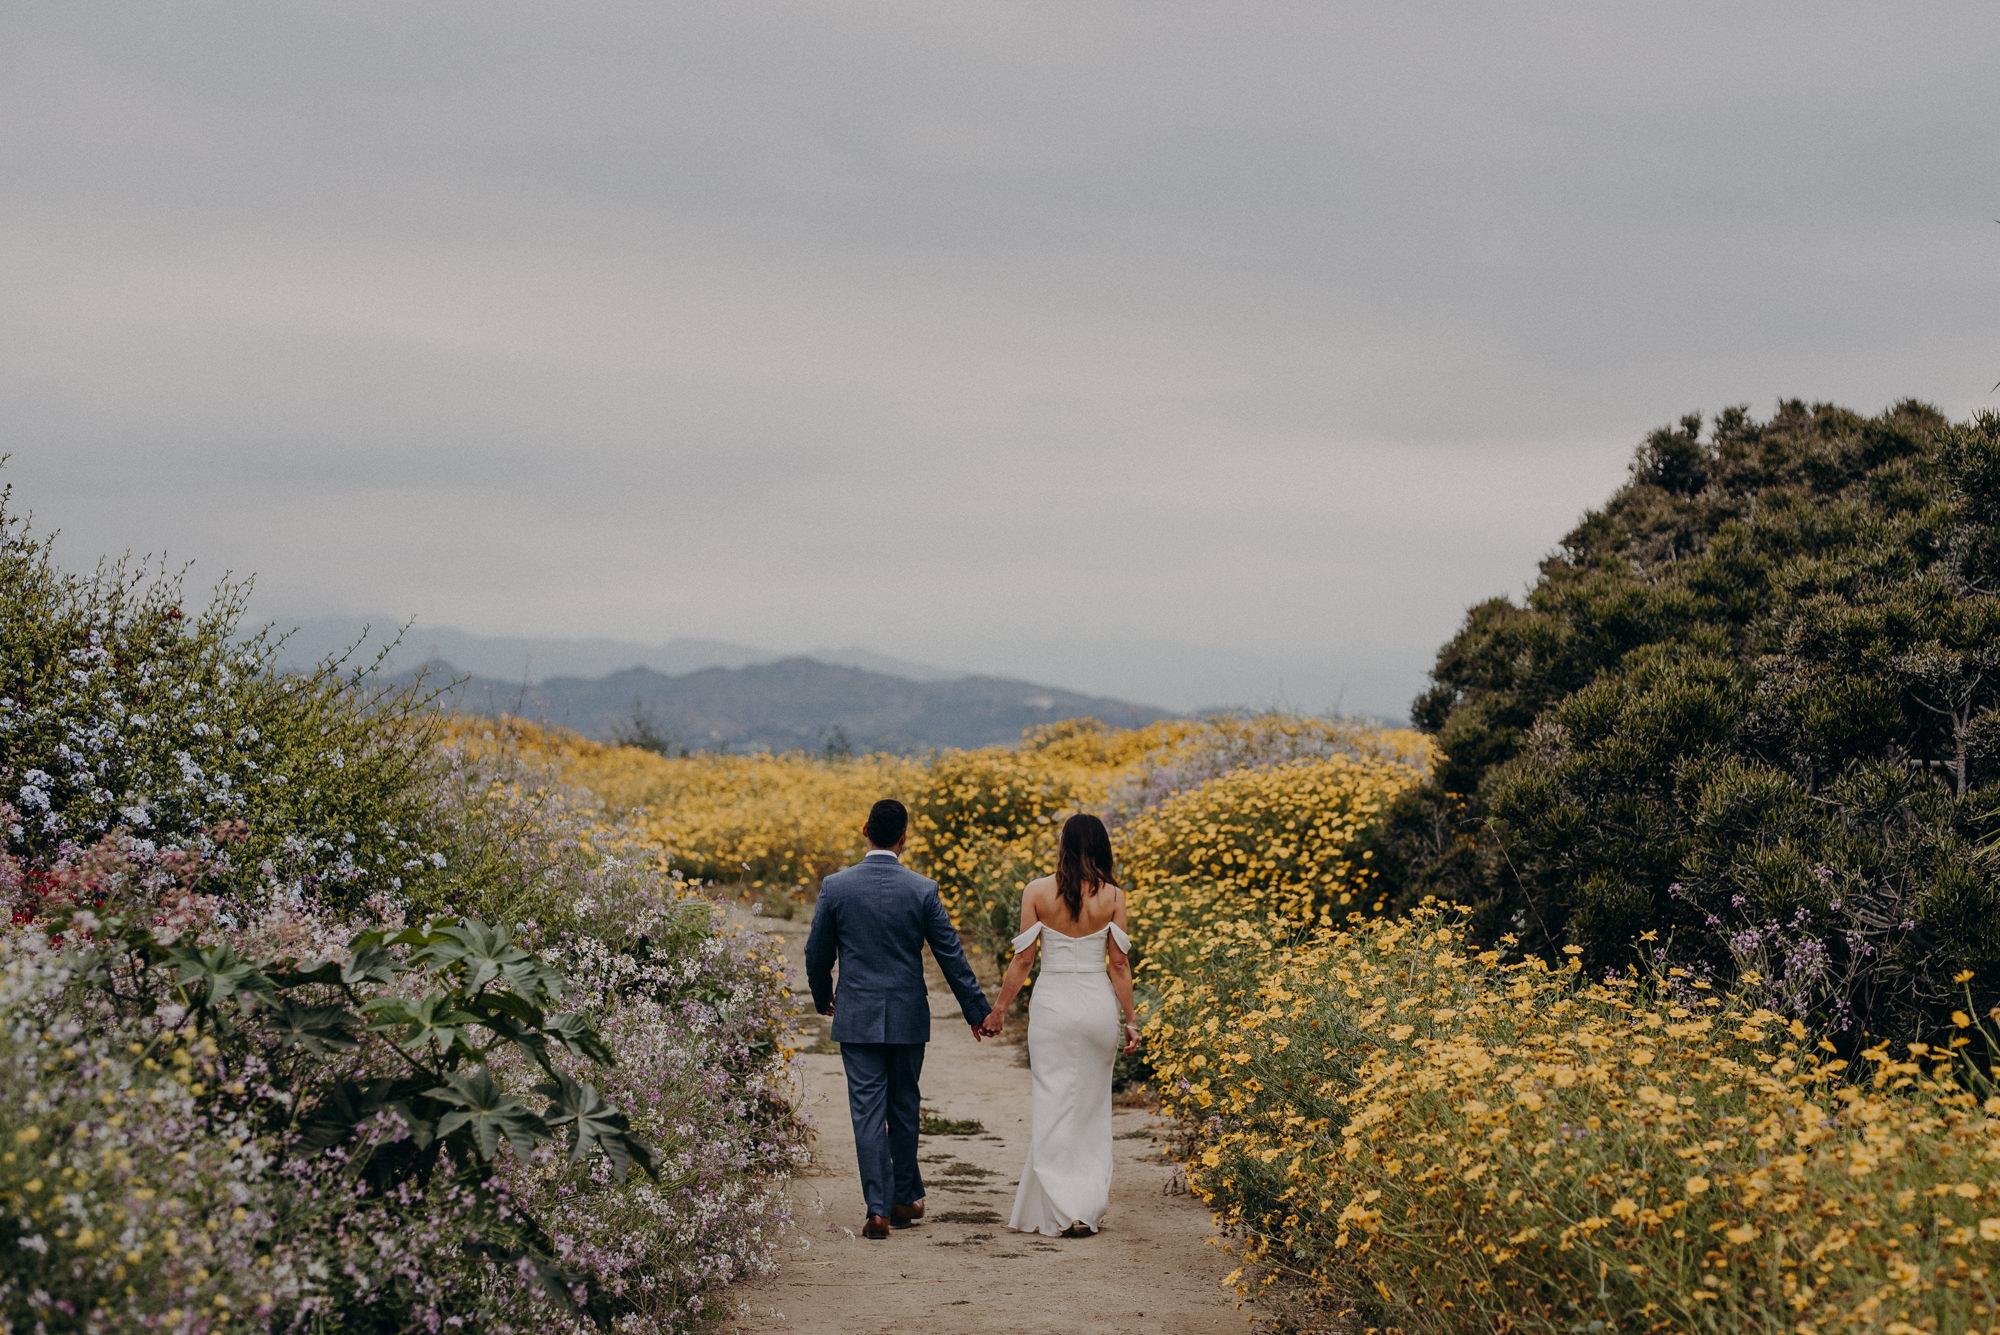 elopement photographer in los angeles - la wedding photographer - isaiahandtaylor.com-056.jpg